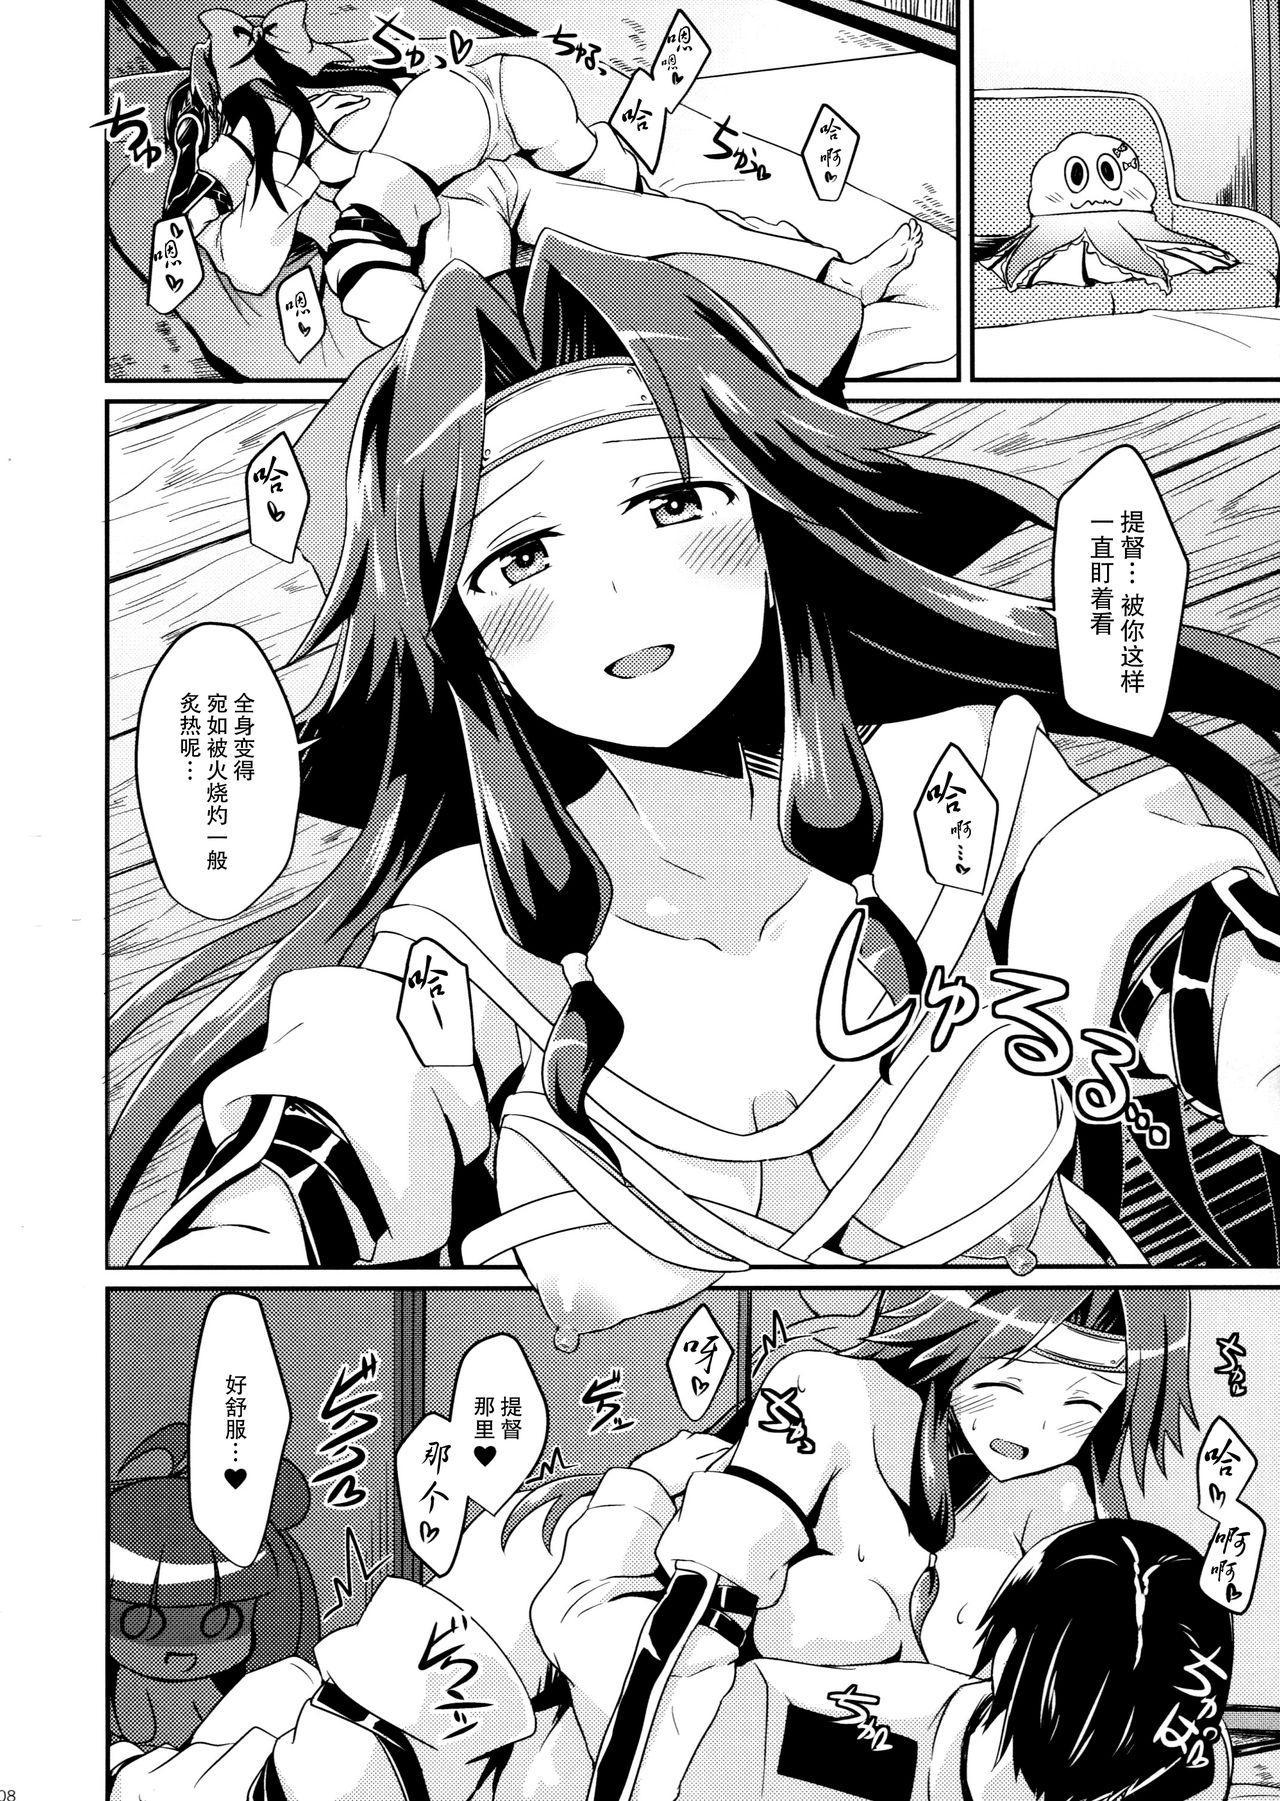 Jintsuu no Omoi 7